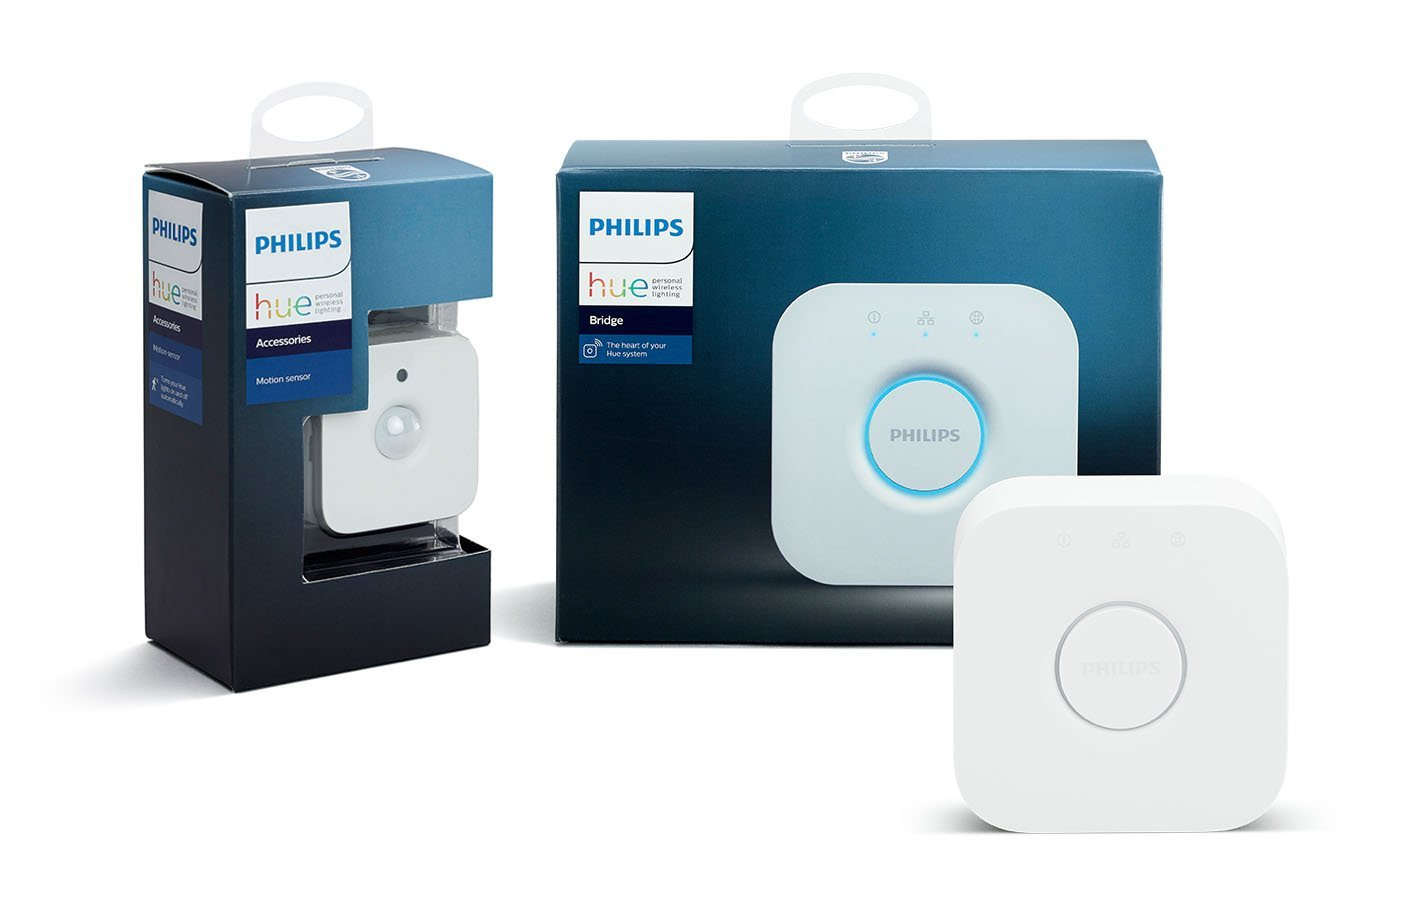 philips-hue-smart-camera